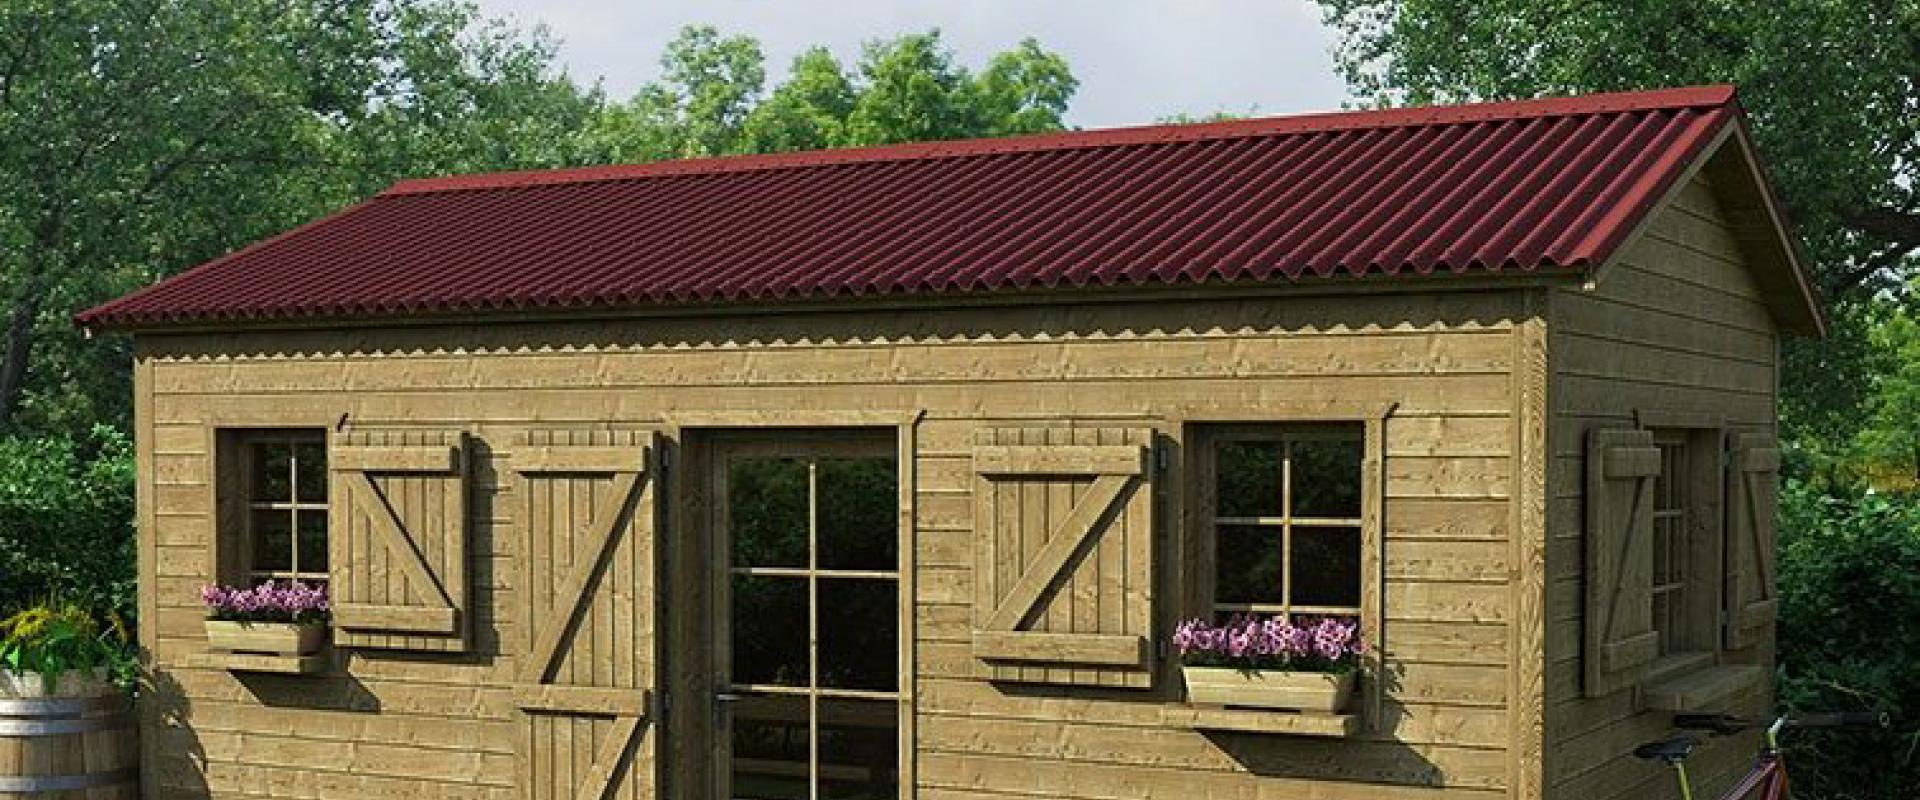 Ondura Ridge Cap For Corrugated Asphalt Roofing Panels